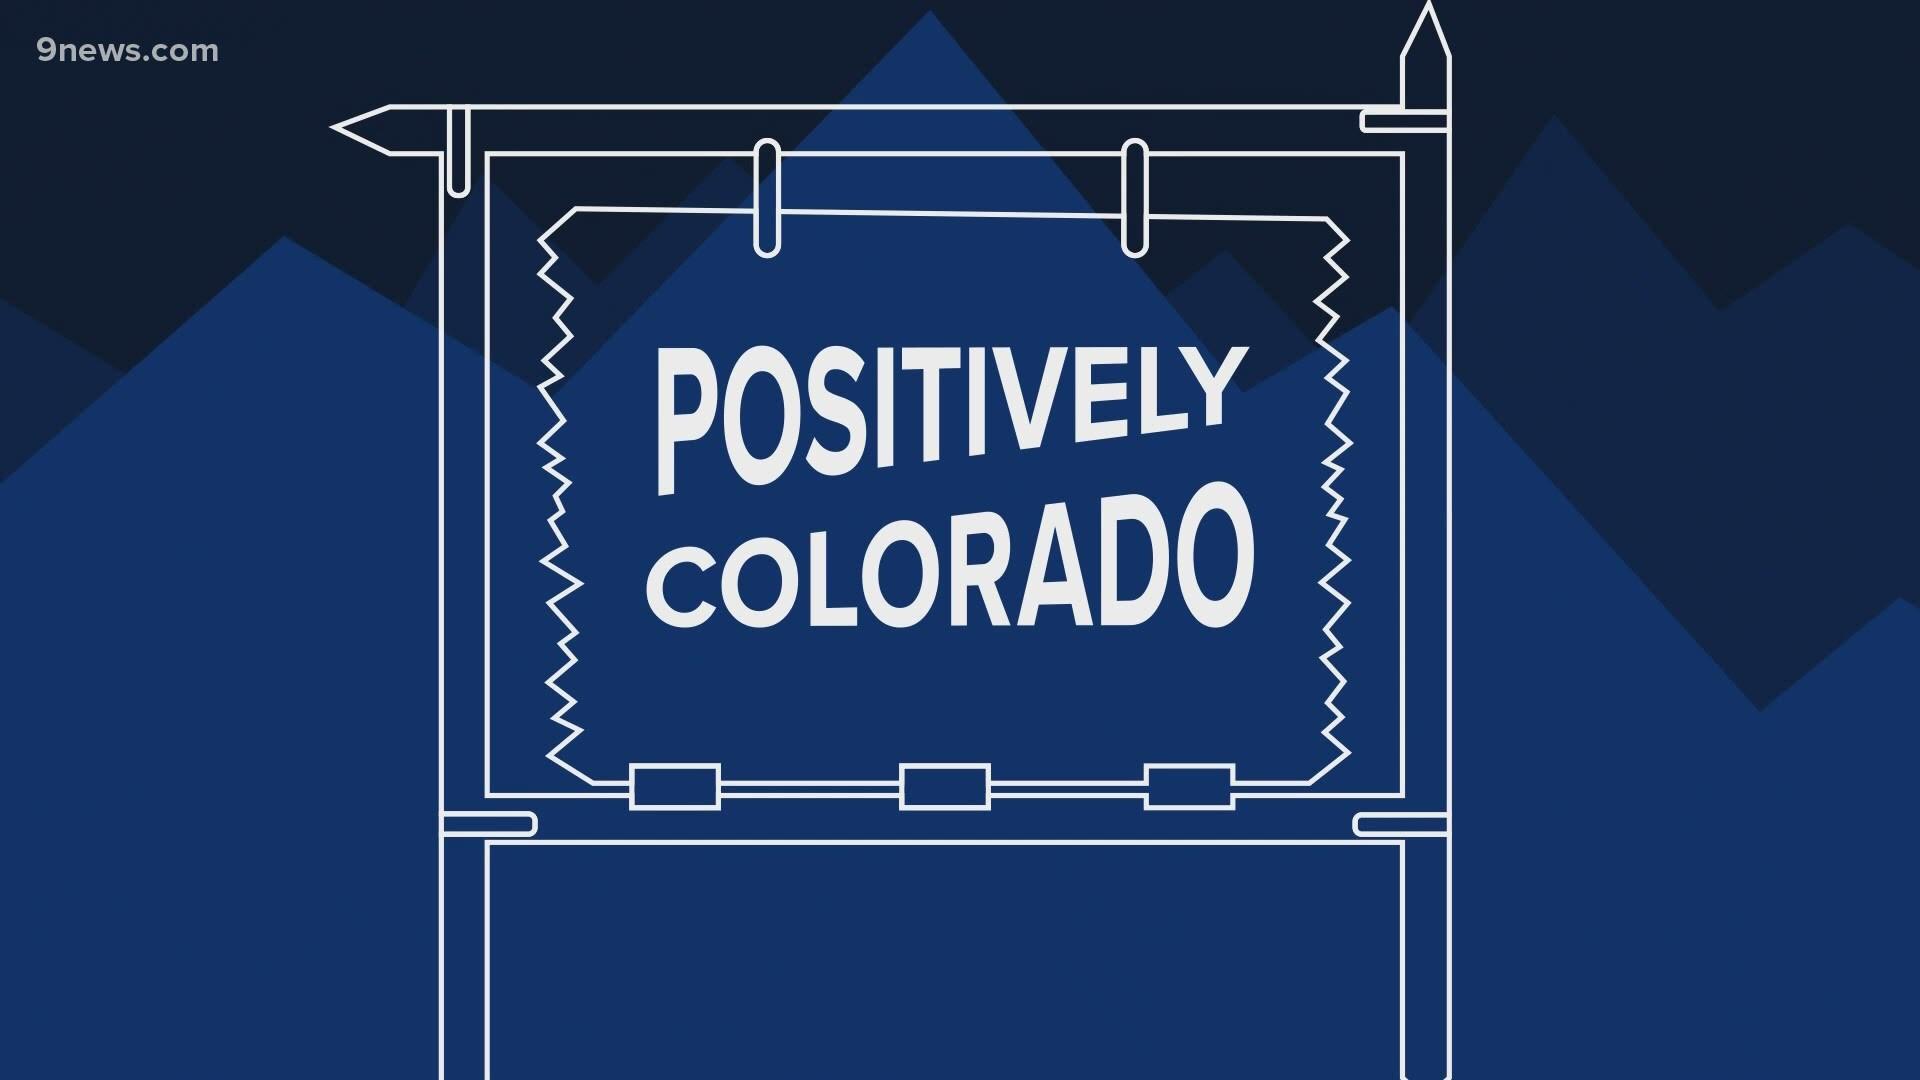 Veterans Day 2020 Deals Discounts Freebies In Denver Colorado 9news Com